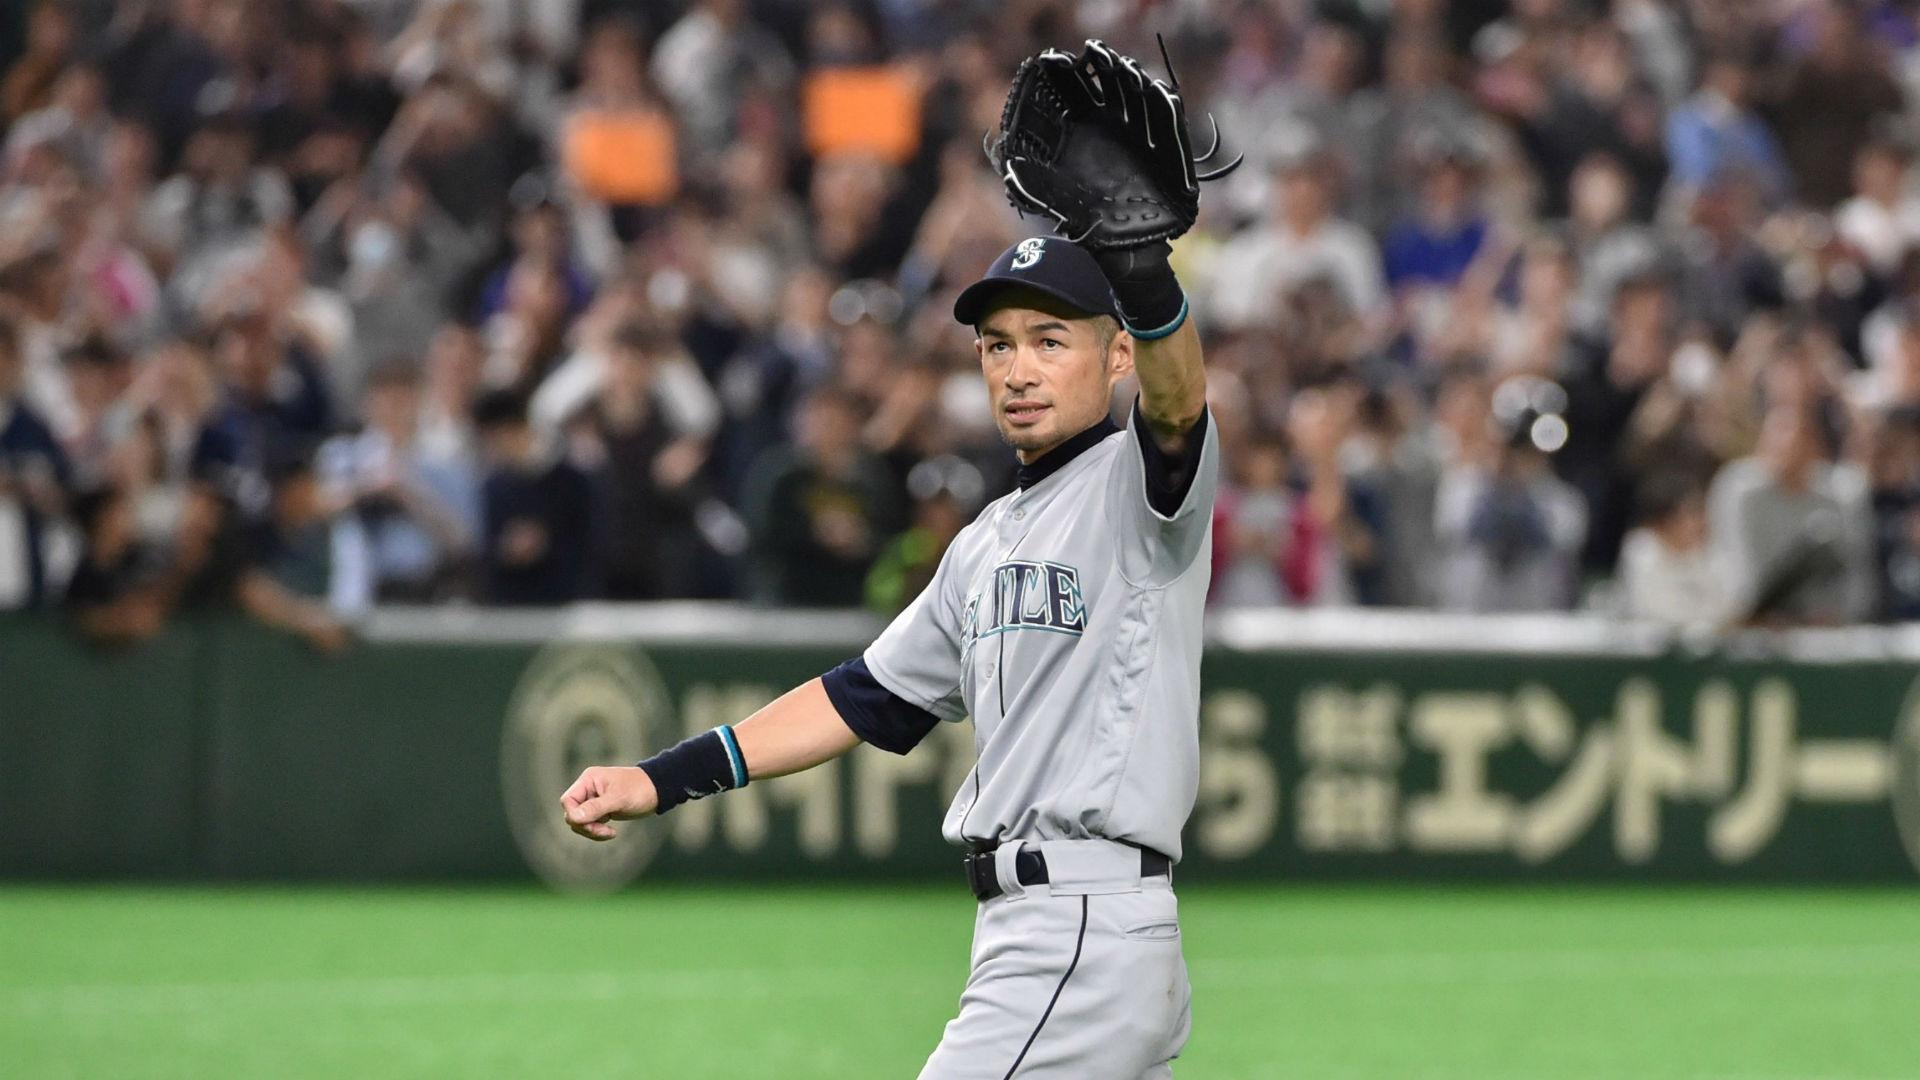 Ichiro retires: Baseball legend bids farewell in Tokyo